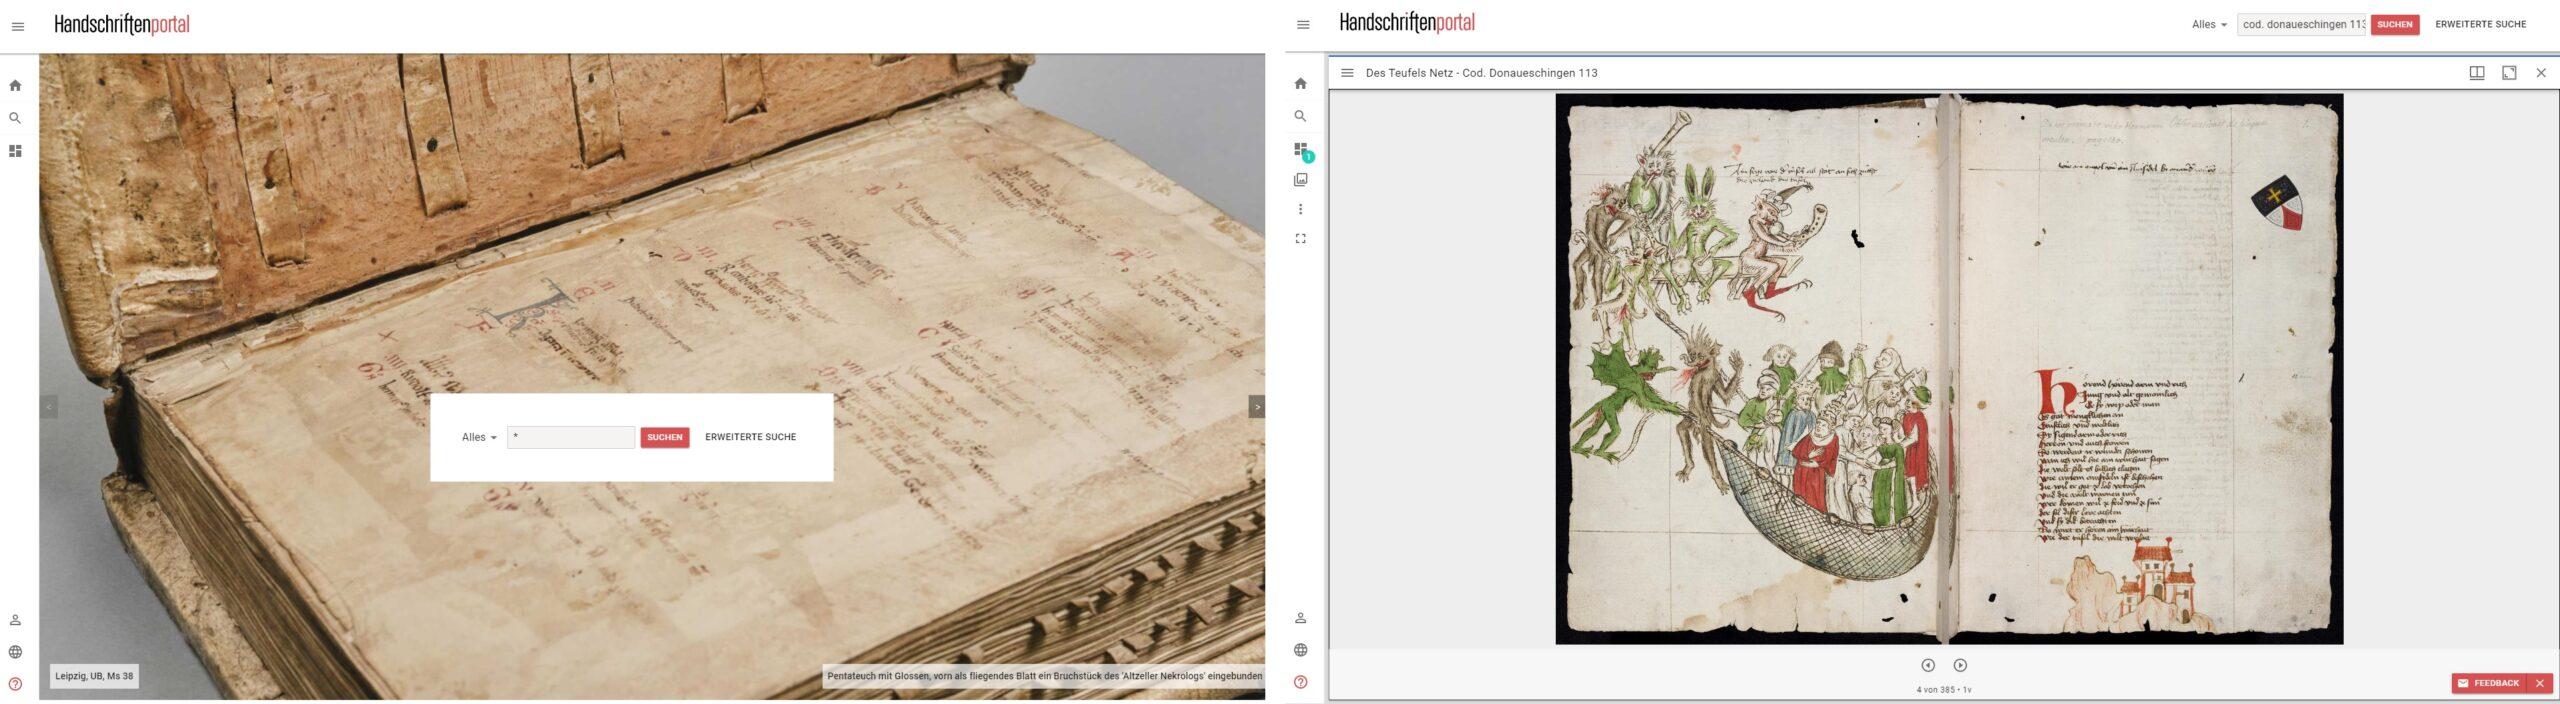 Zwei Ansichten aus der Testumgebung des Handschriftenportals